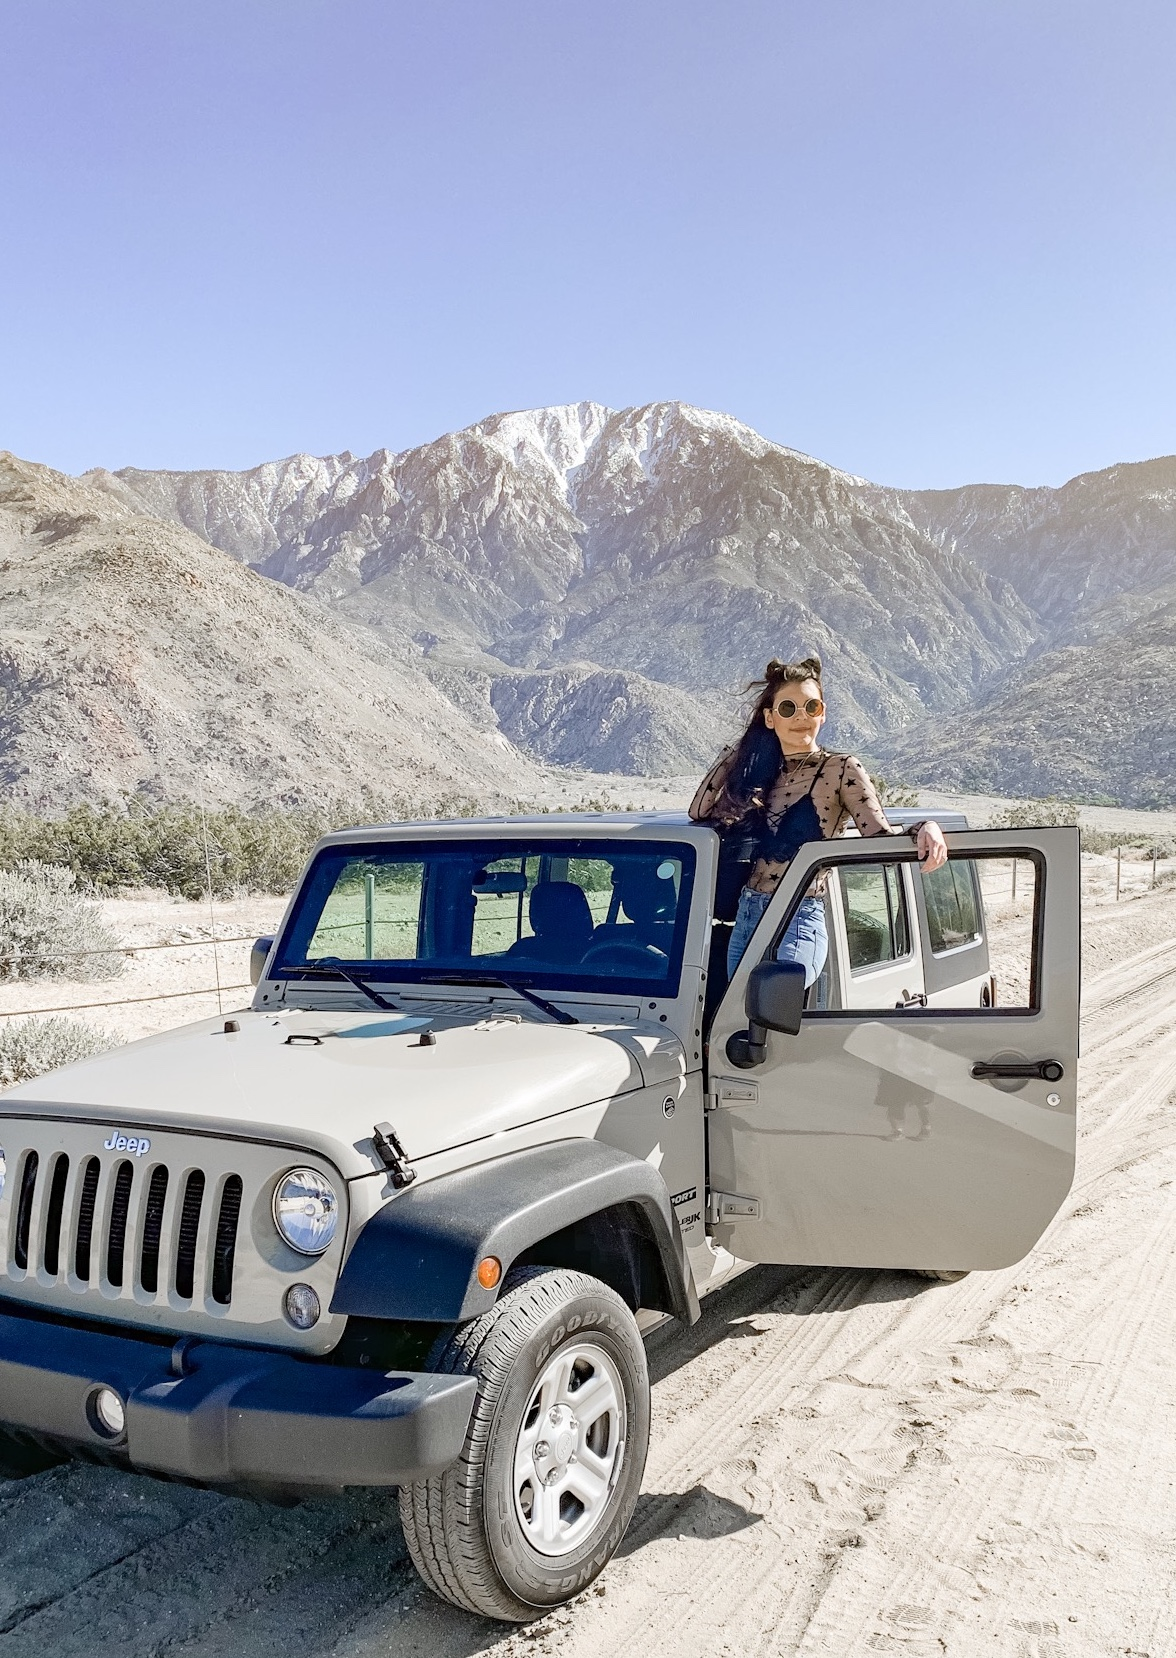 Things to do around Coachella -